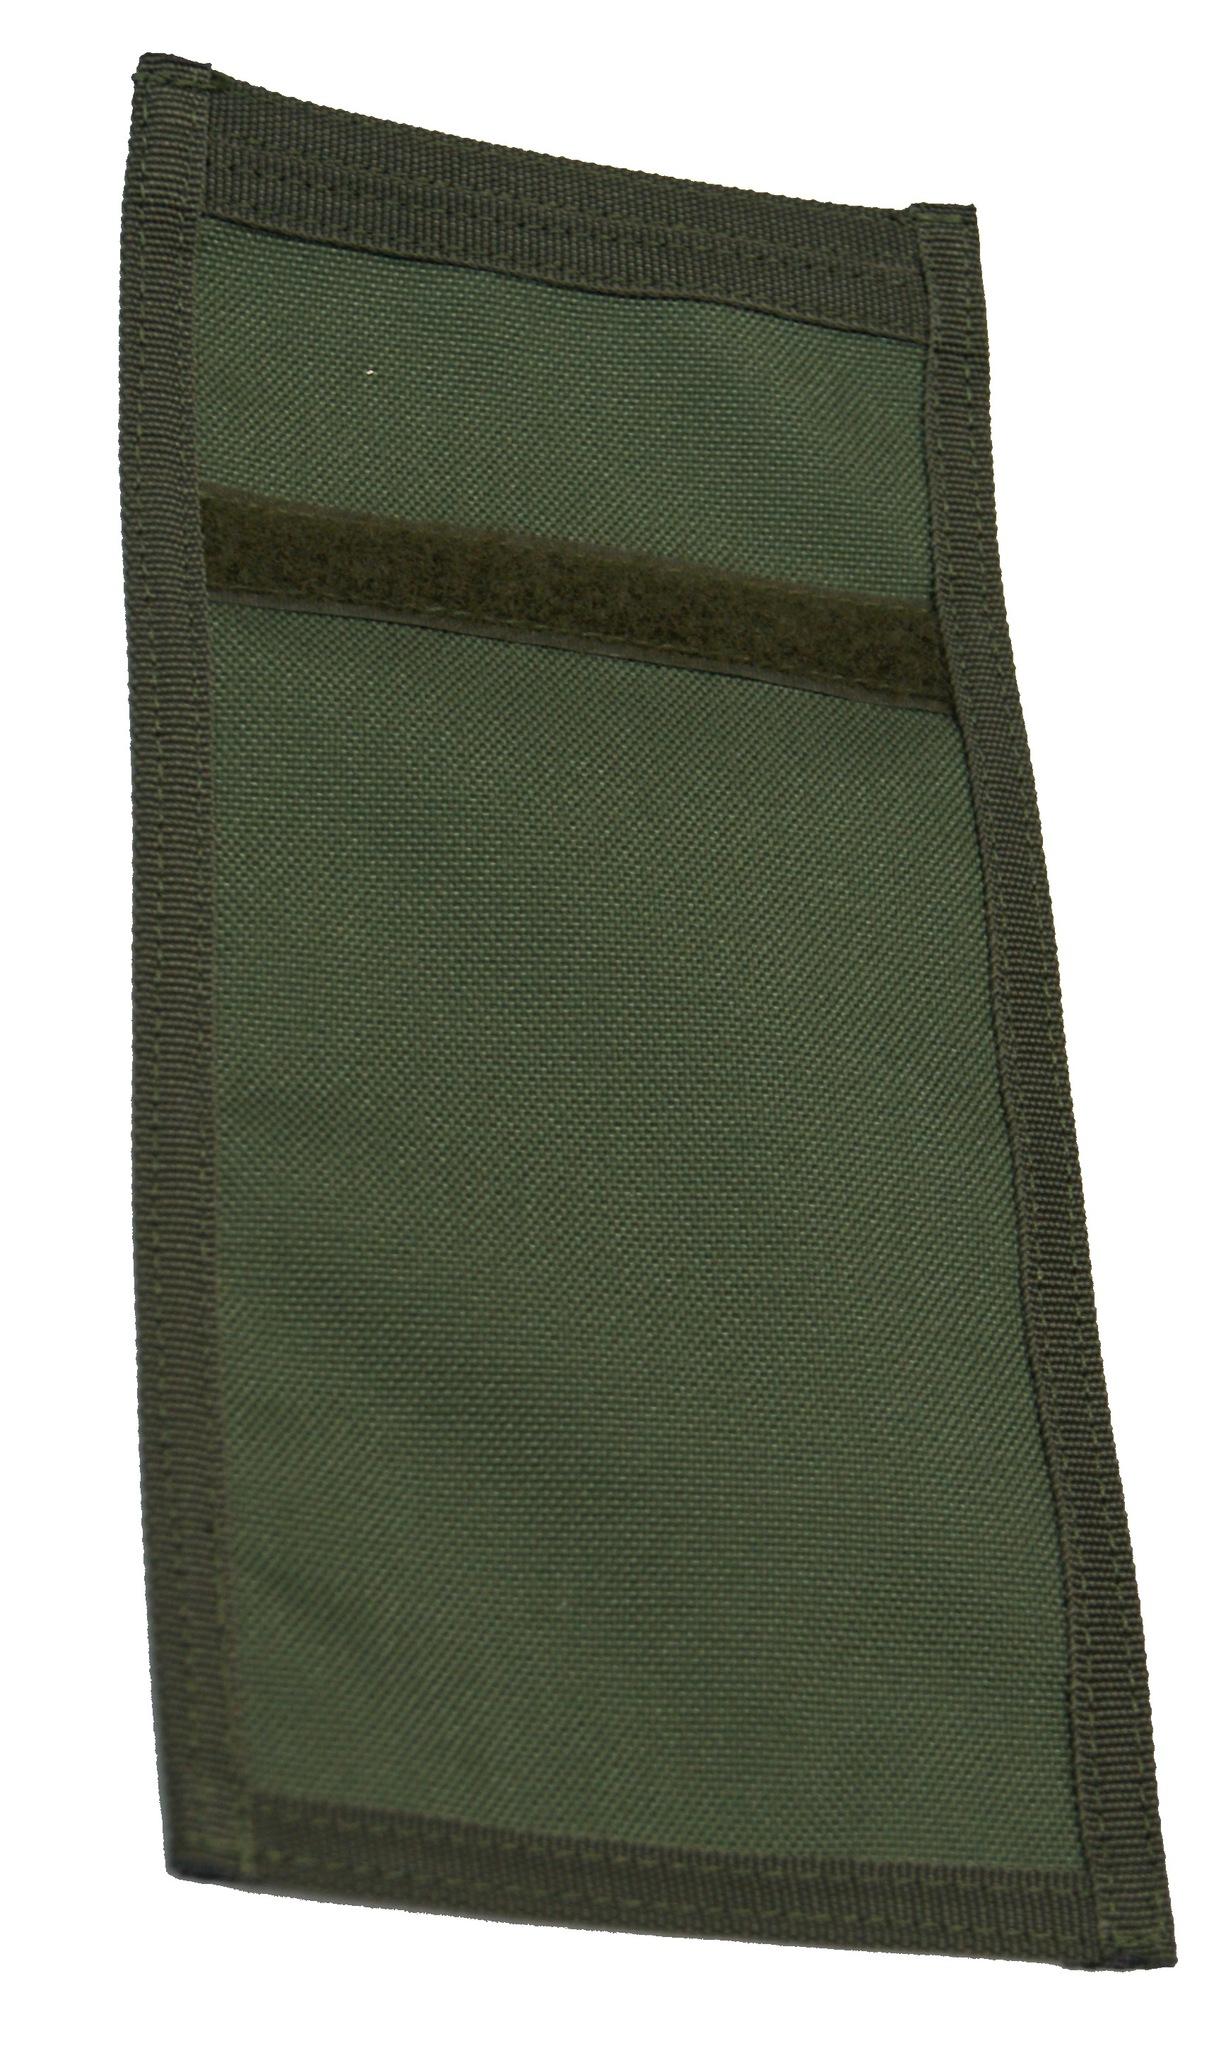 Чехол для планшета, ноутбука RadioBlock Case AVP, 30х50 см